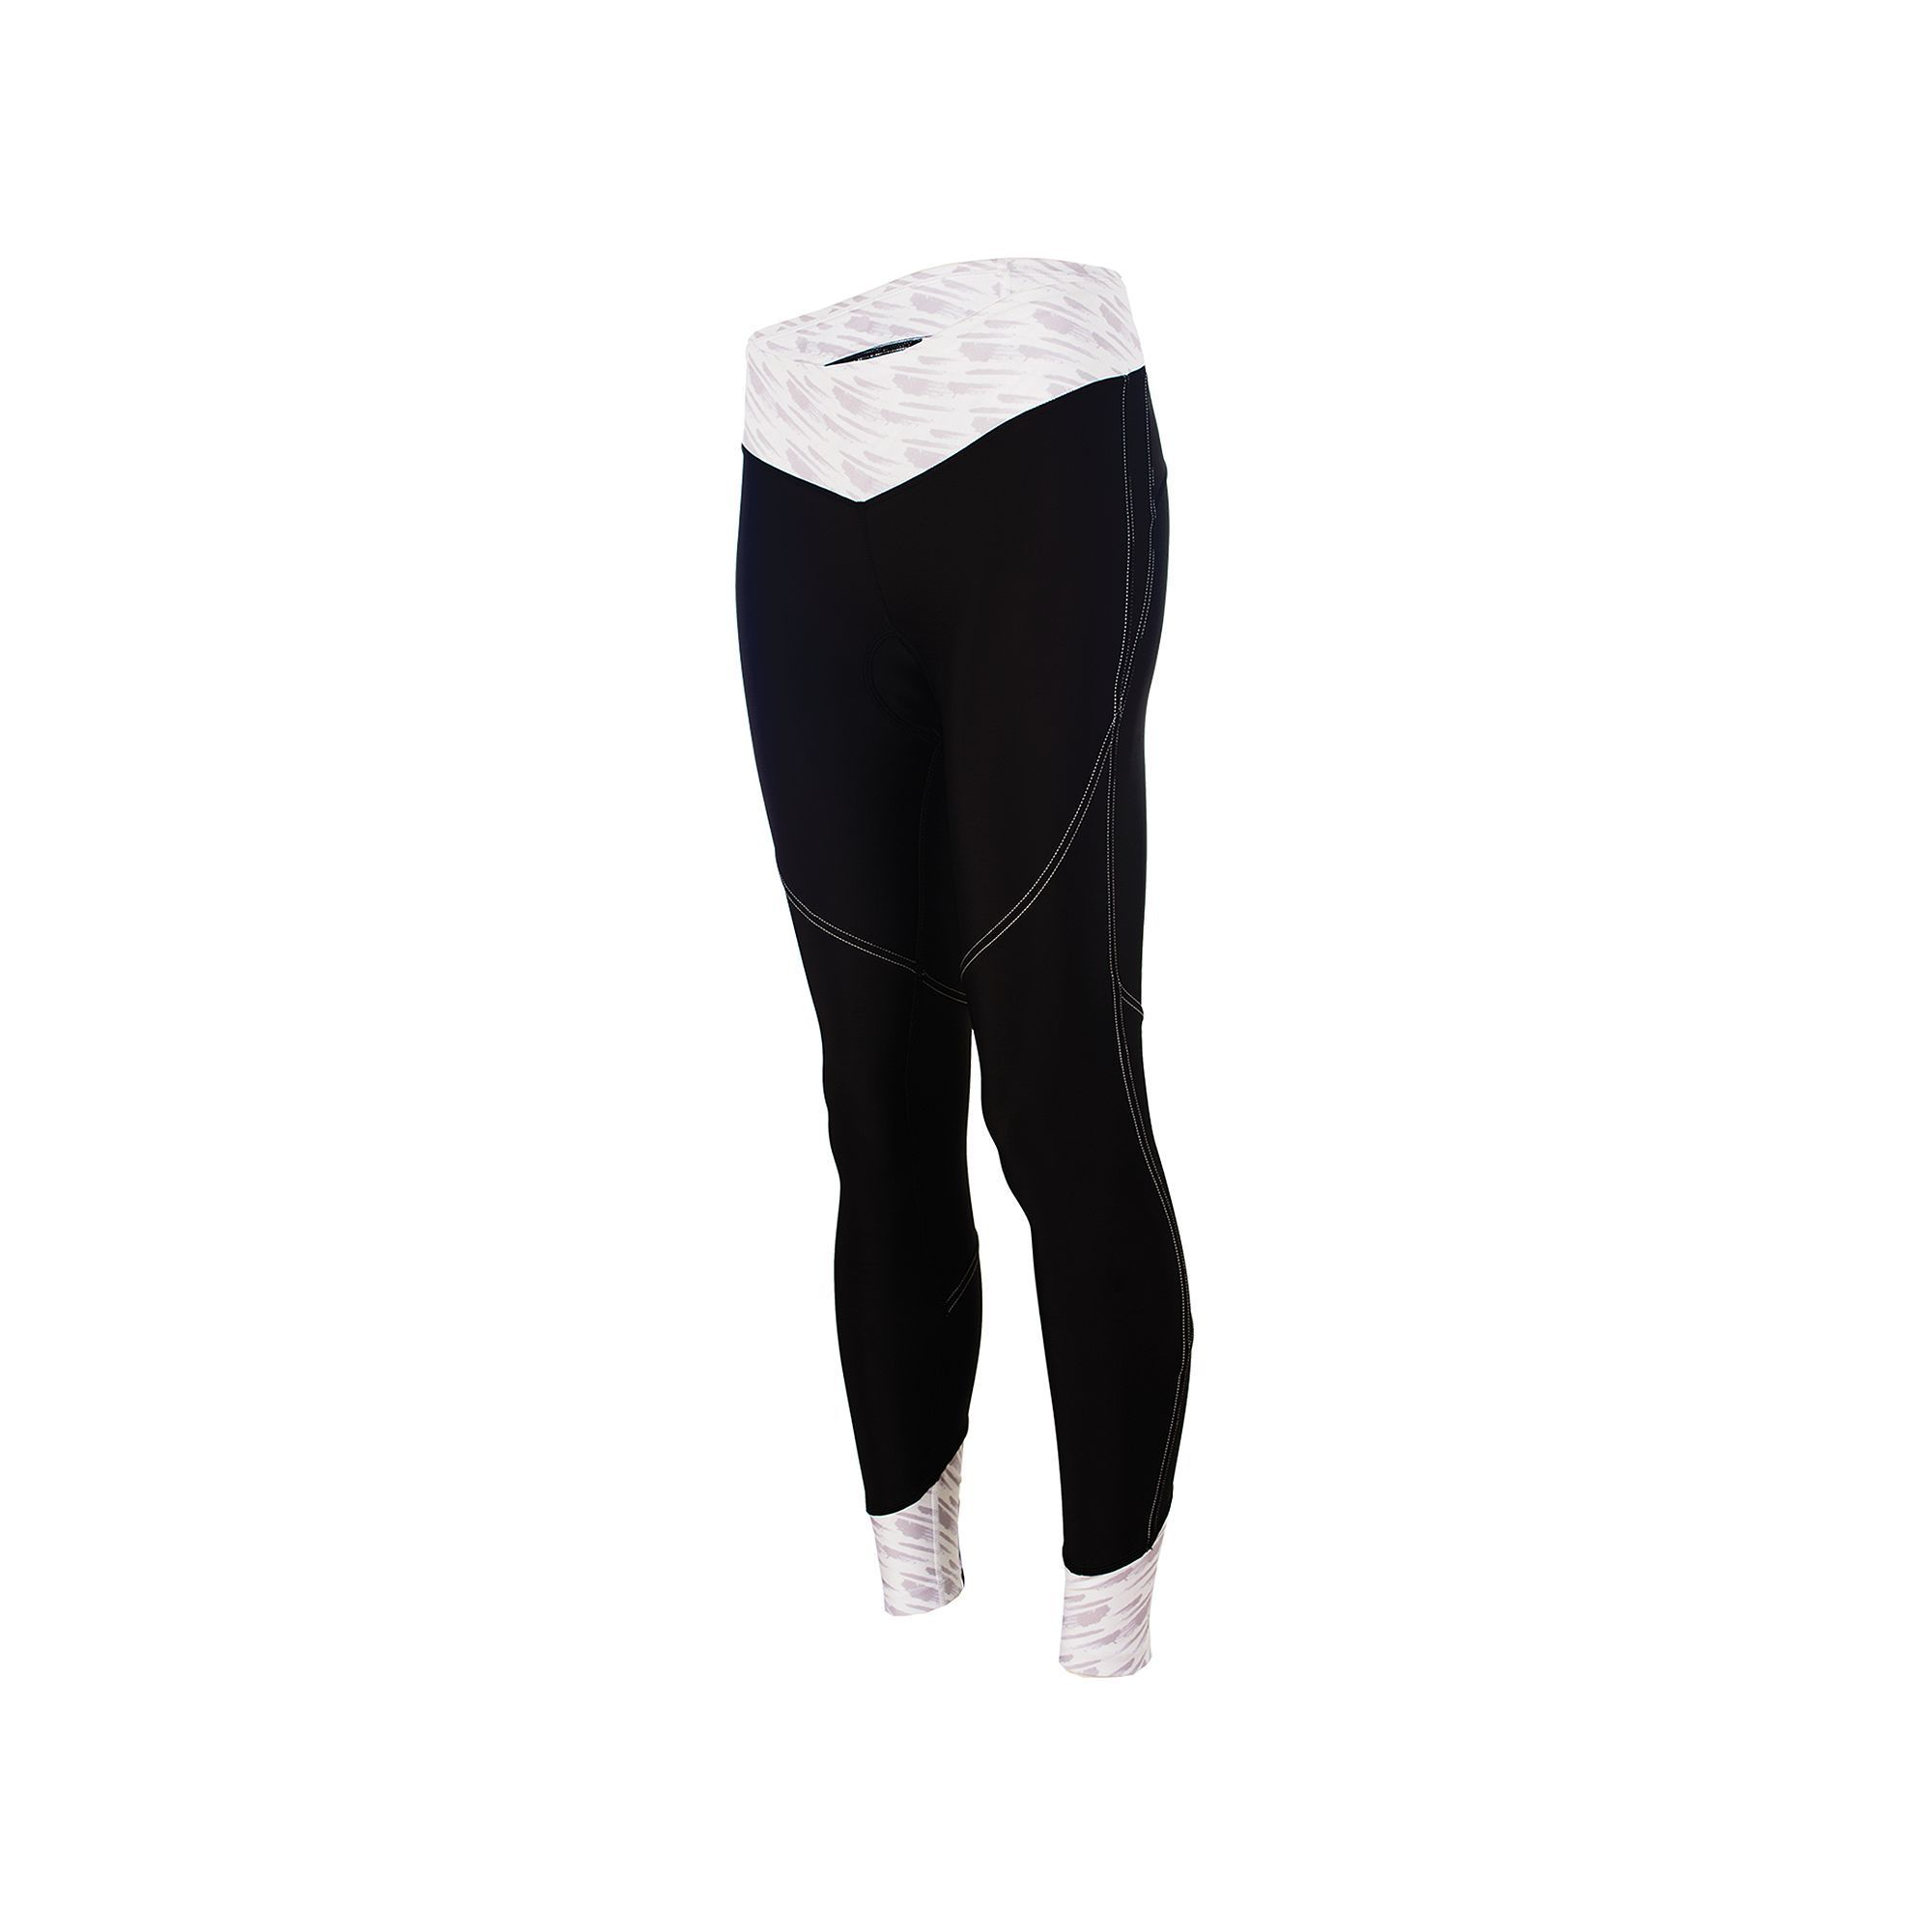 Muddyfox Pure Cycling Shorts - Joe Maloy c70b1b87e